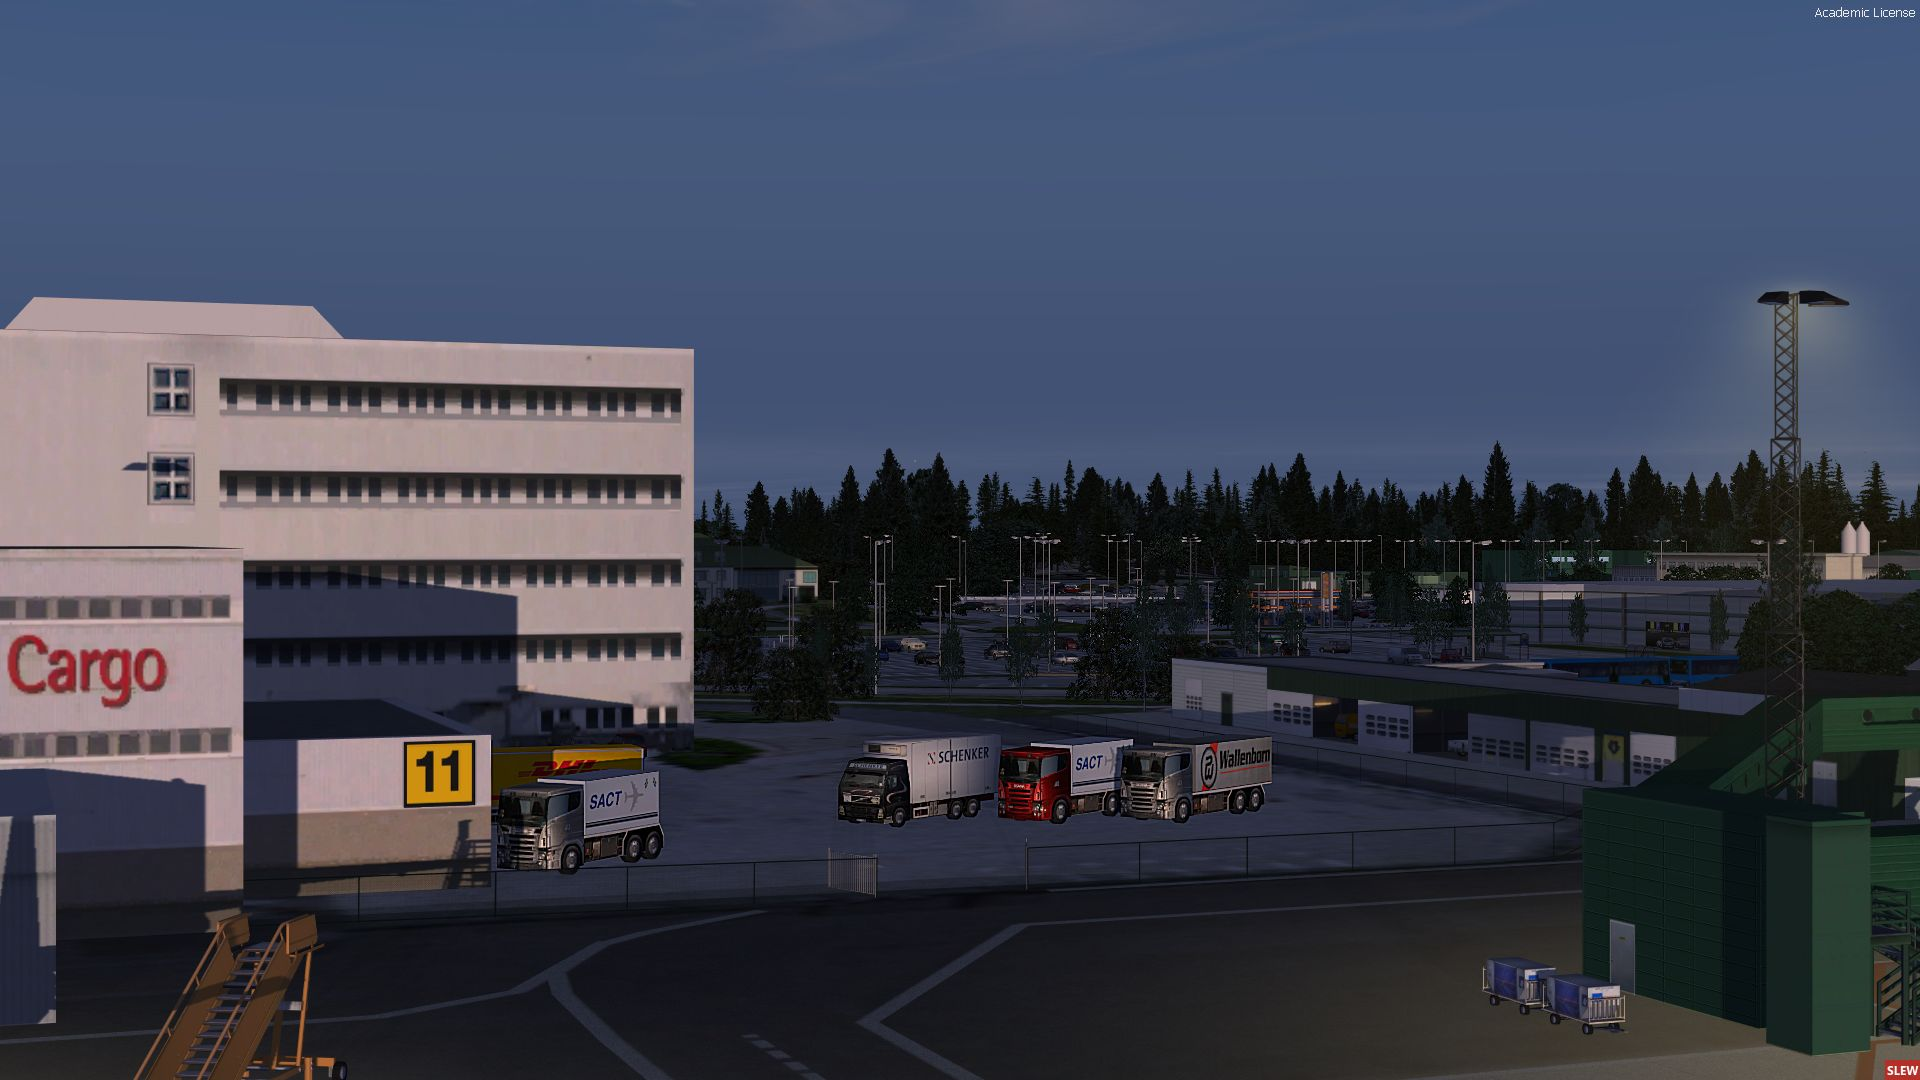 16 New fence & vehicles.jpg